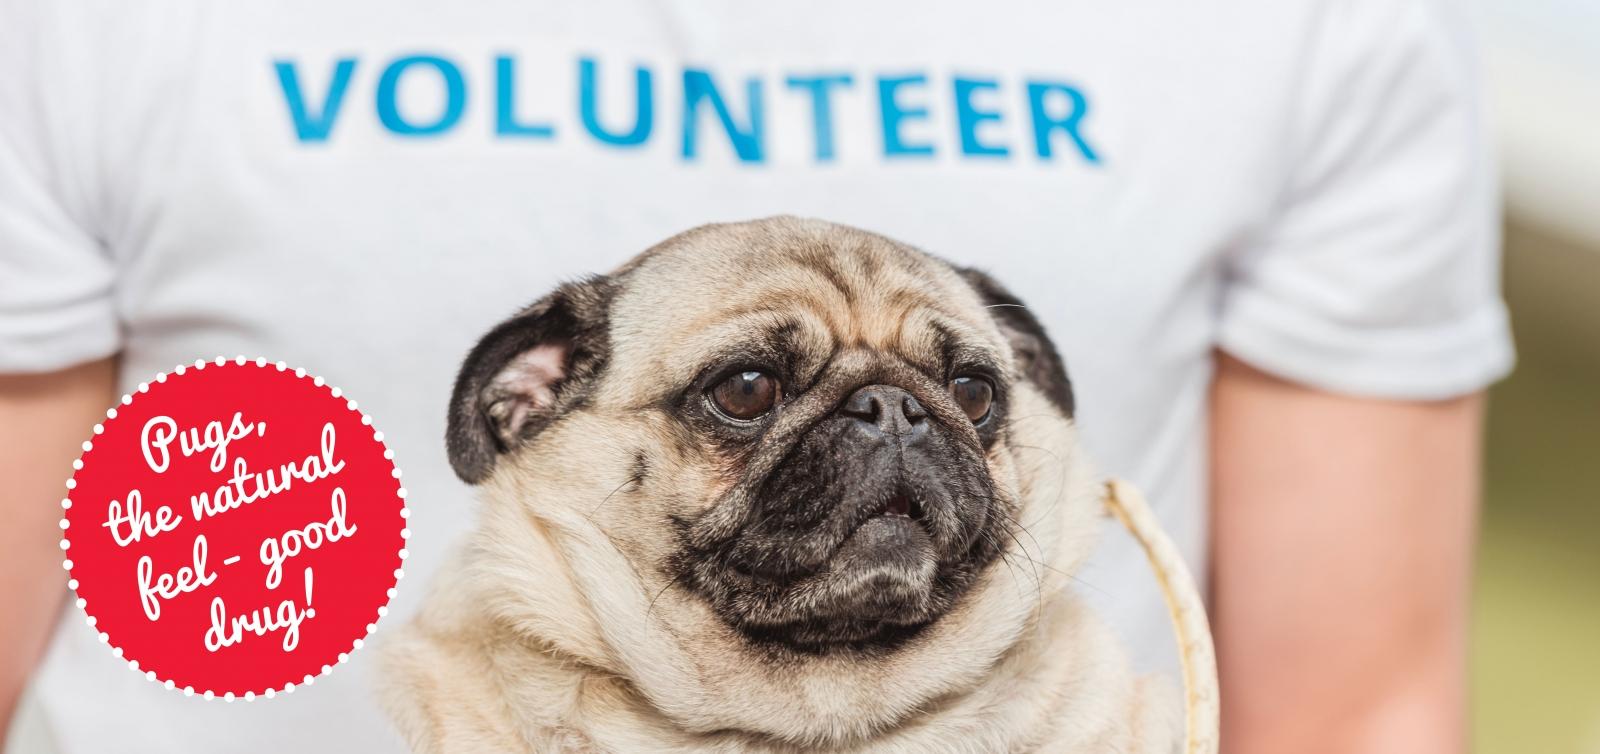 5 Fun Volunteer Ideas to Help Shelter Dogs   Modern Dog magazine